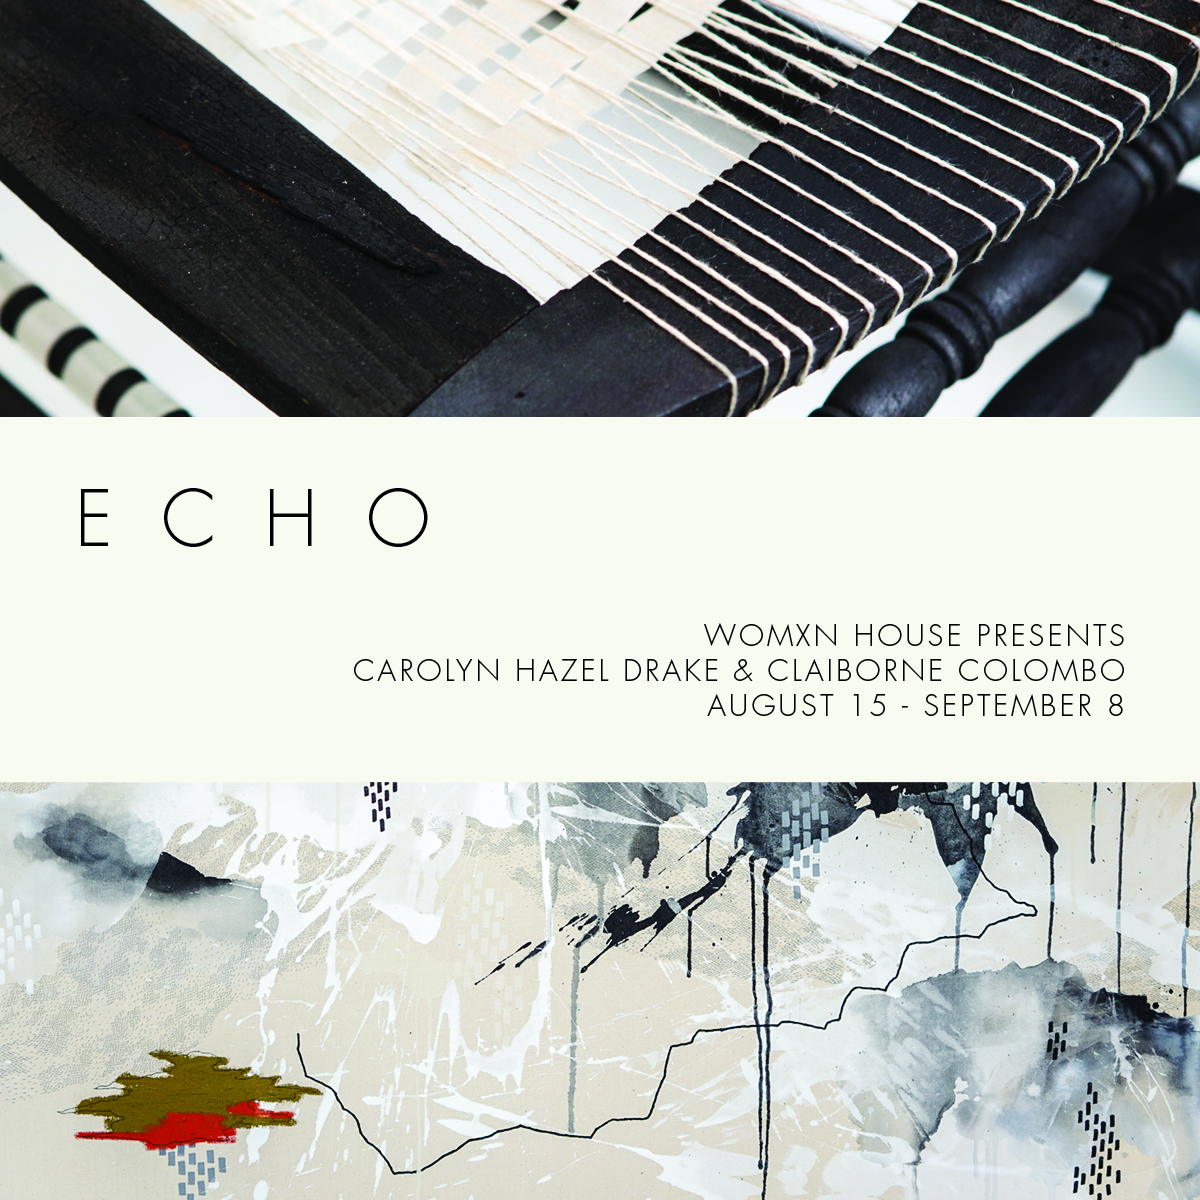 ECHO_Invite-Poster_4x4.jpg